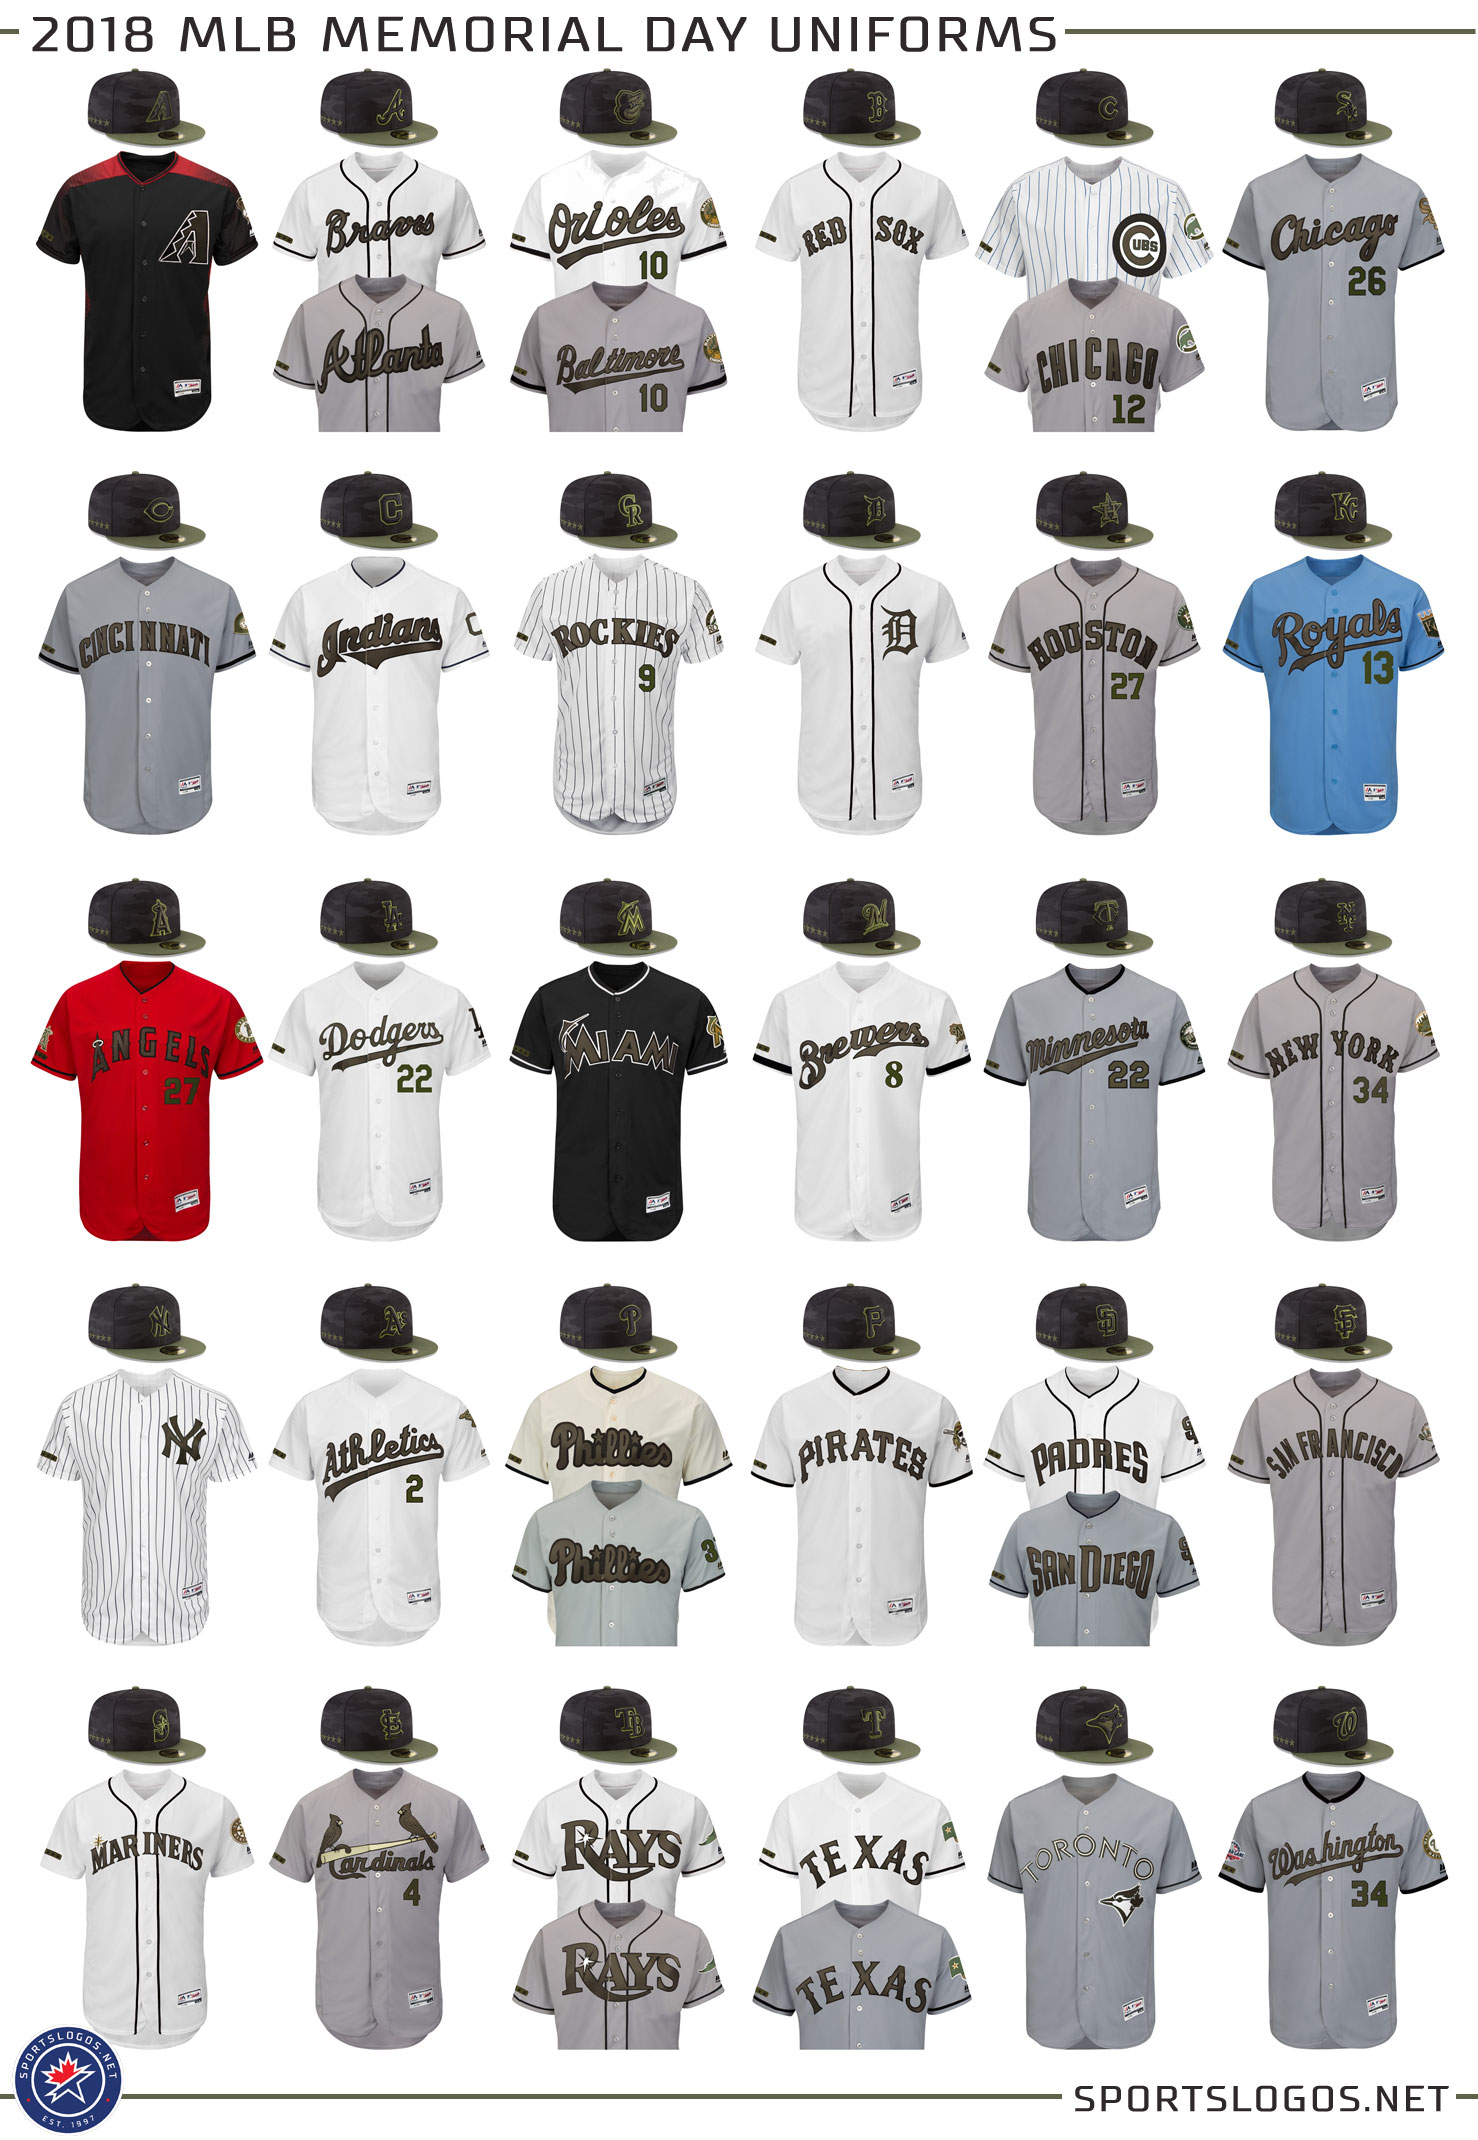 2018 MLB Memorial Day Uniforms All Teams  e58d6173c8b